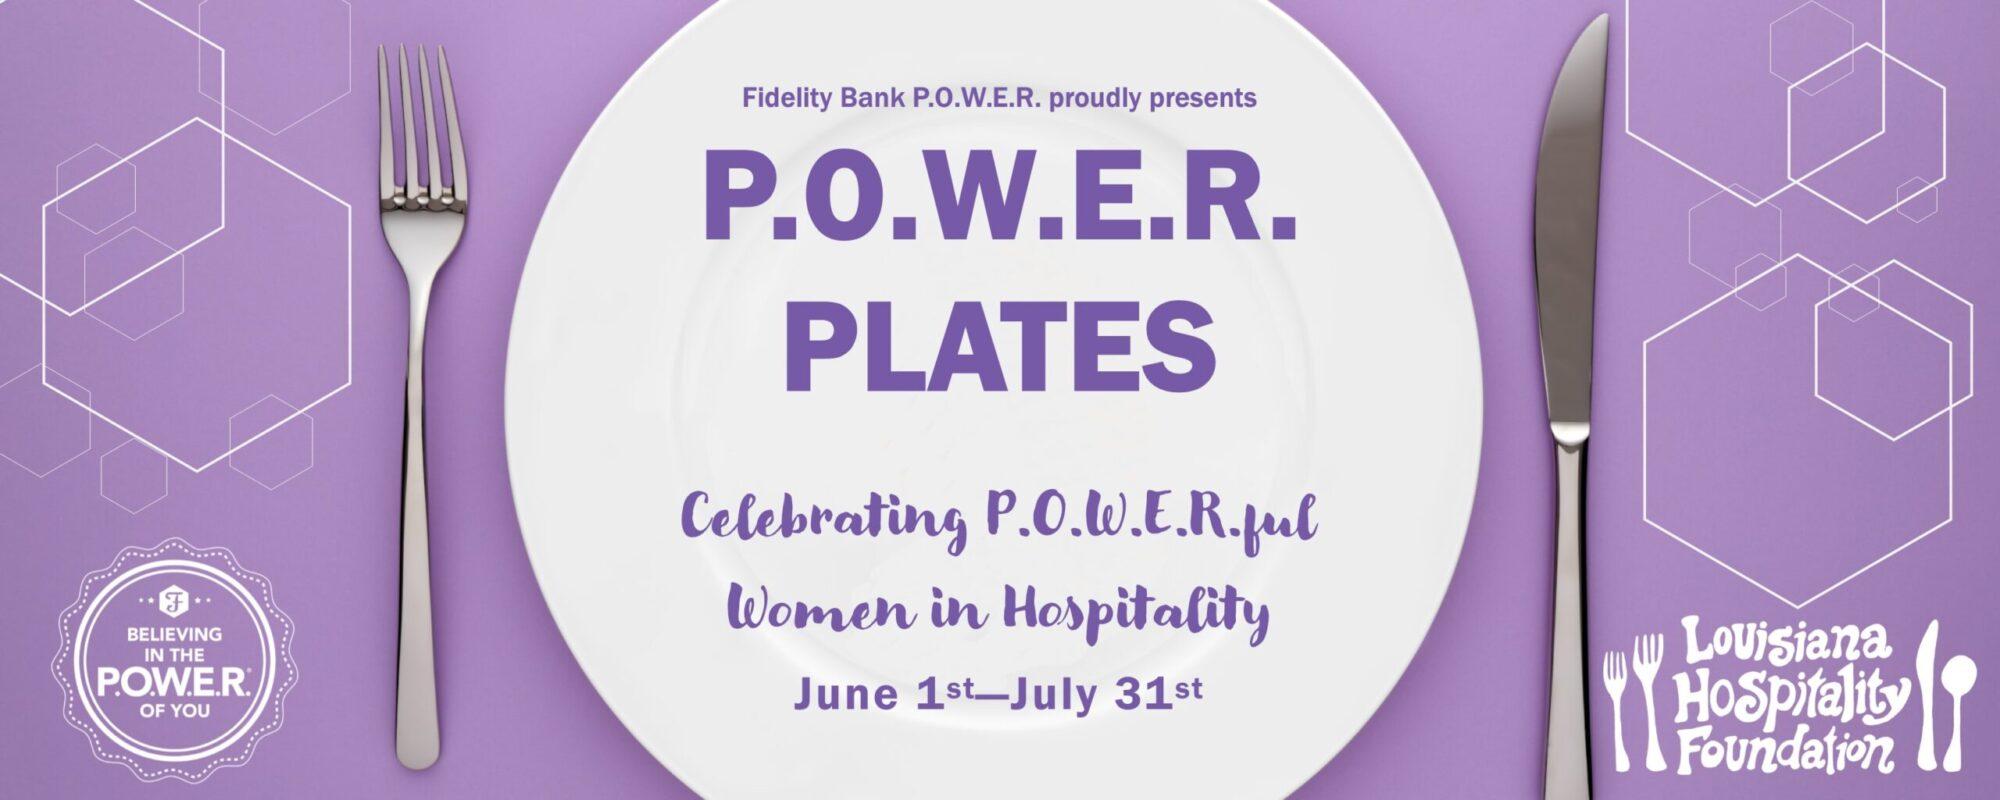 POWER Plates - Banner 1